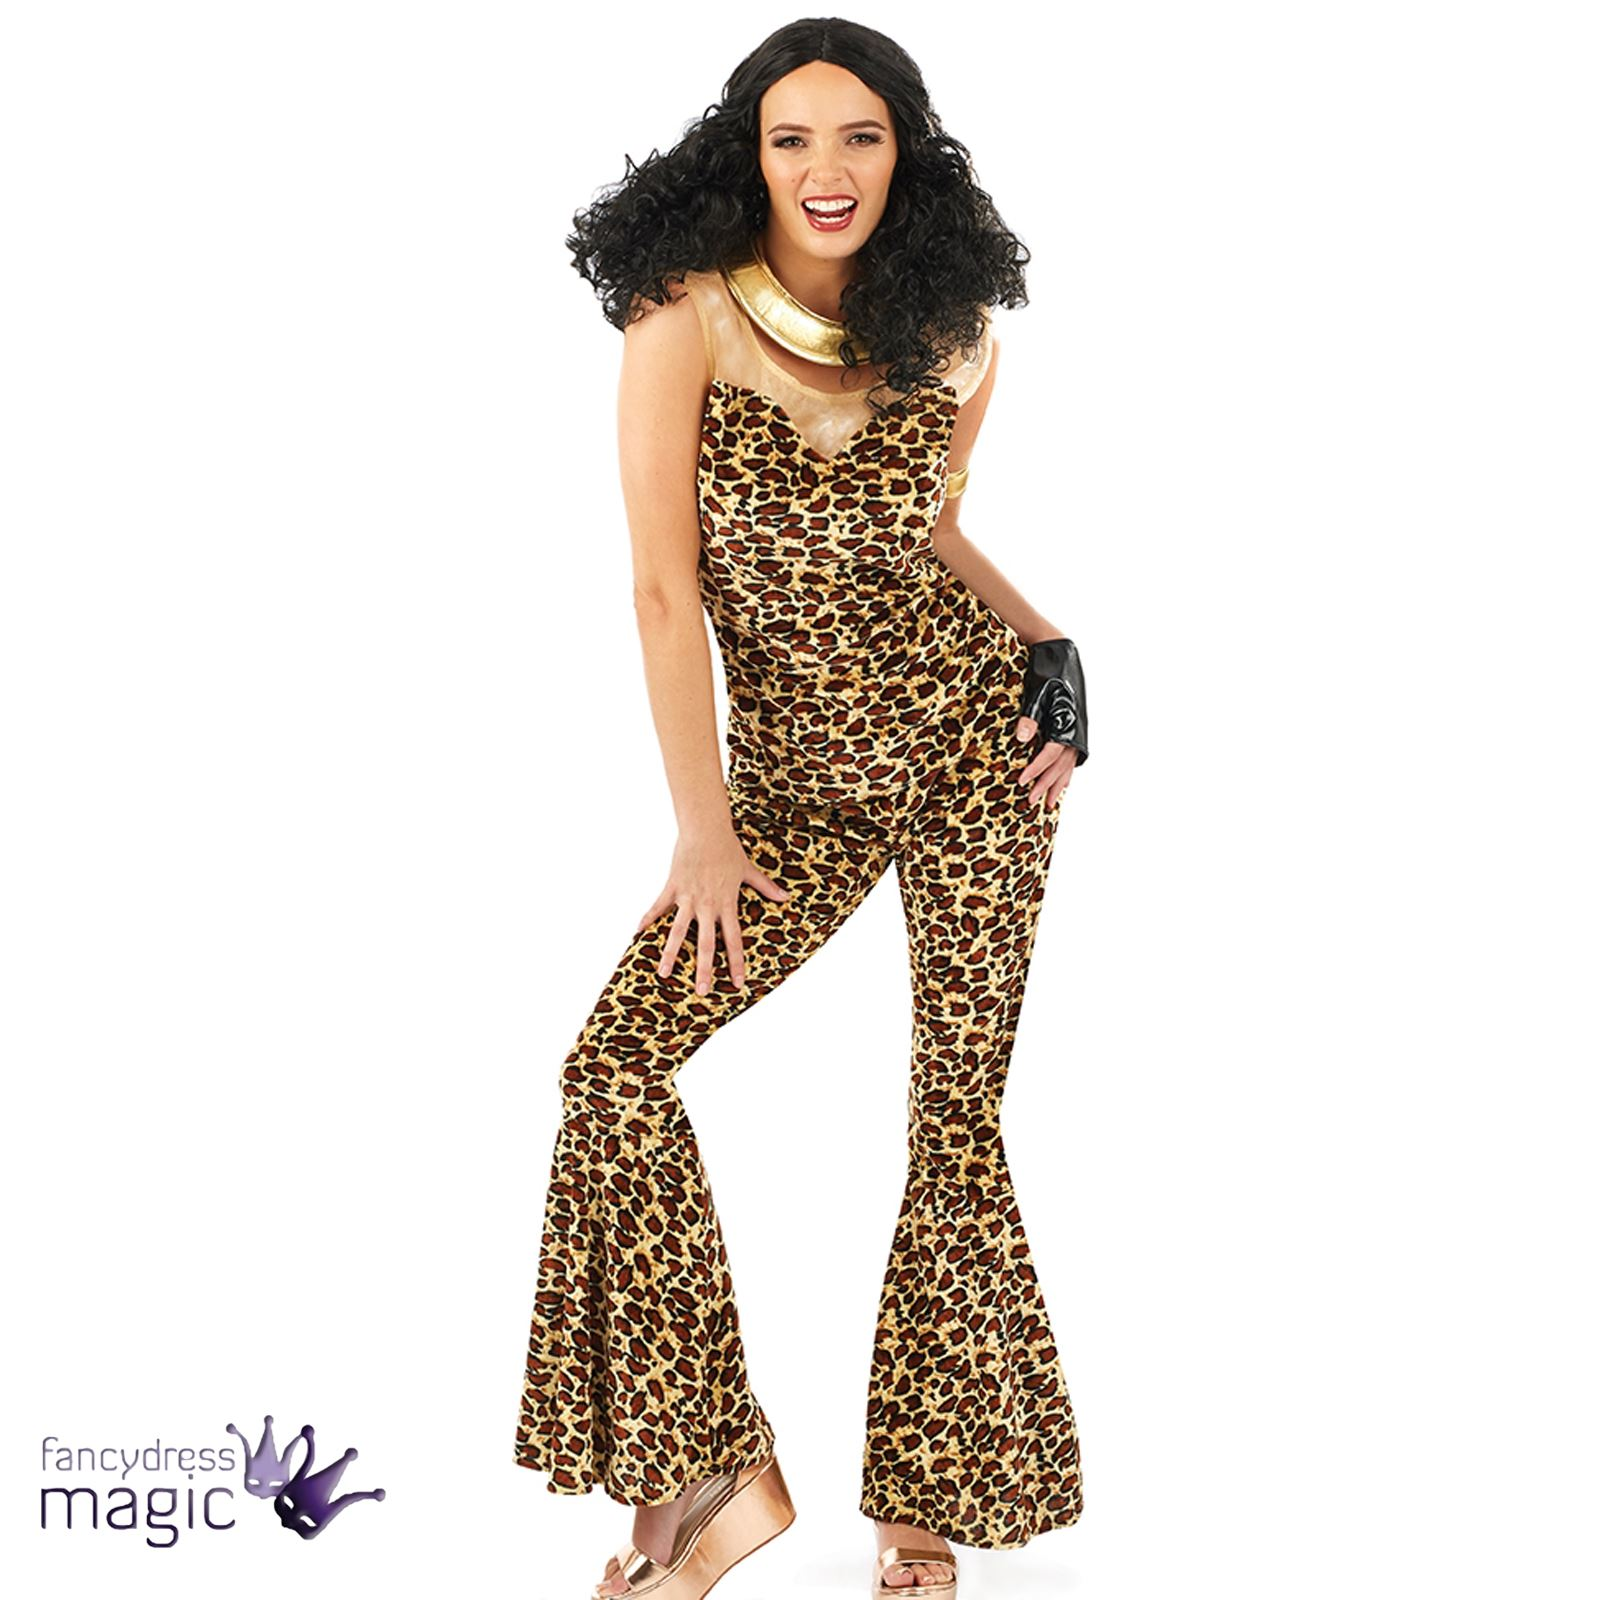 Femmes adulte ann es 90 pop effrayant piment costume d guisement ebay - Deguisement annee 90 femme ...